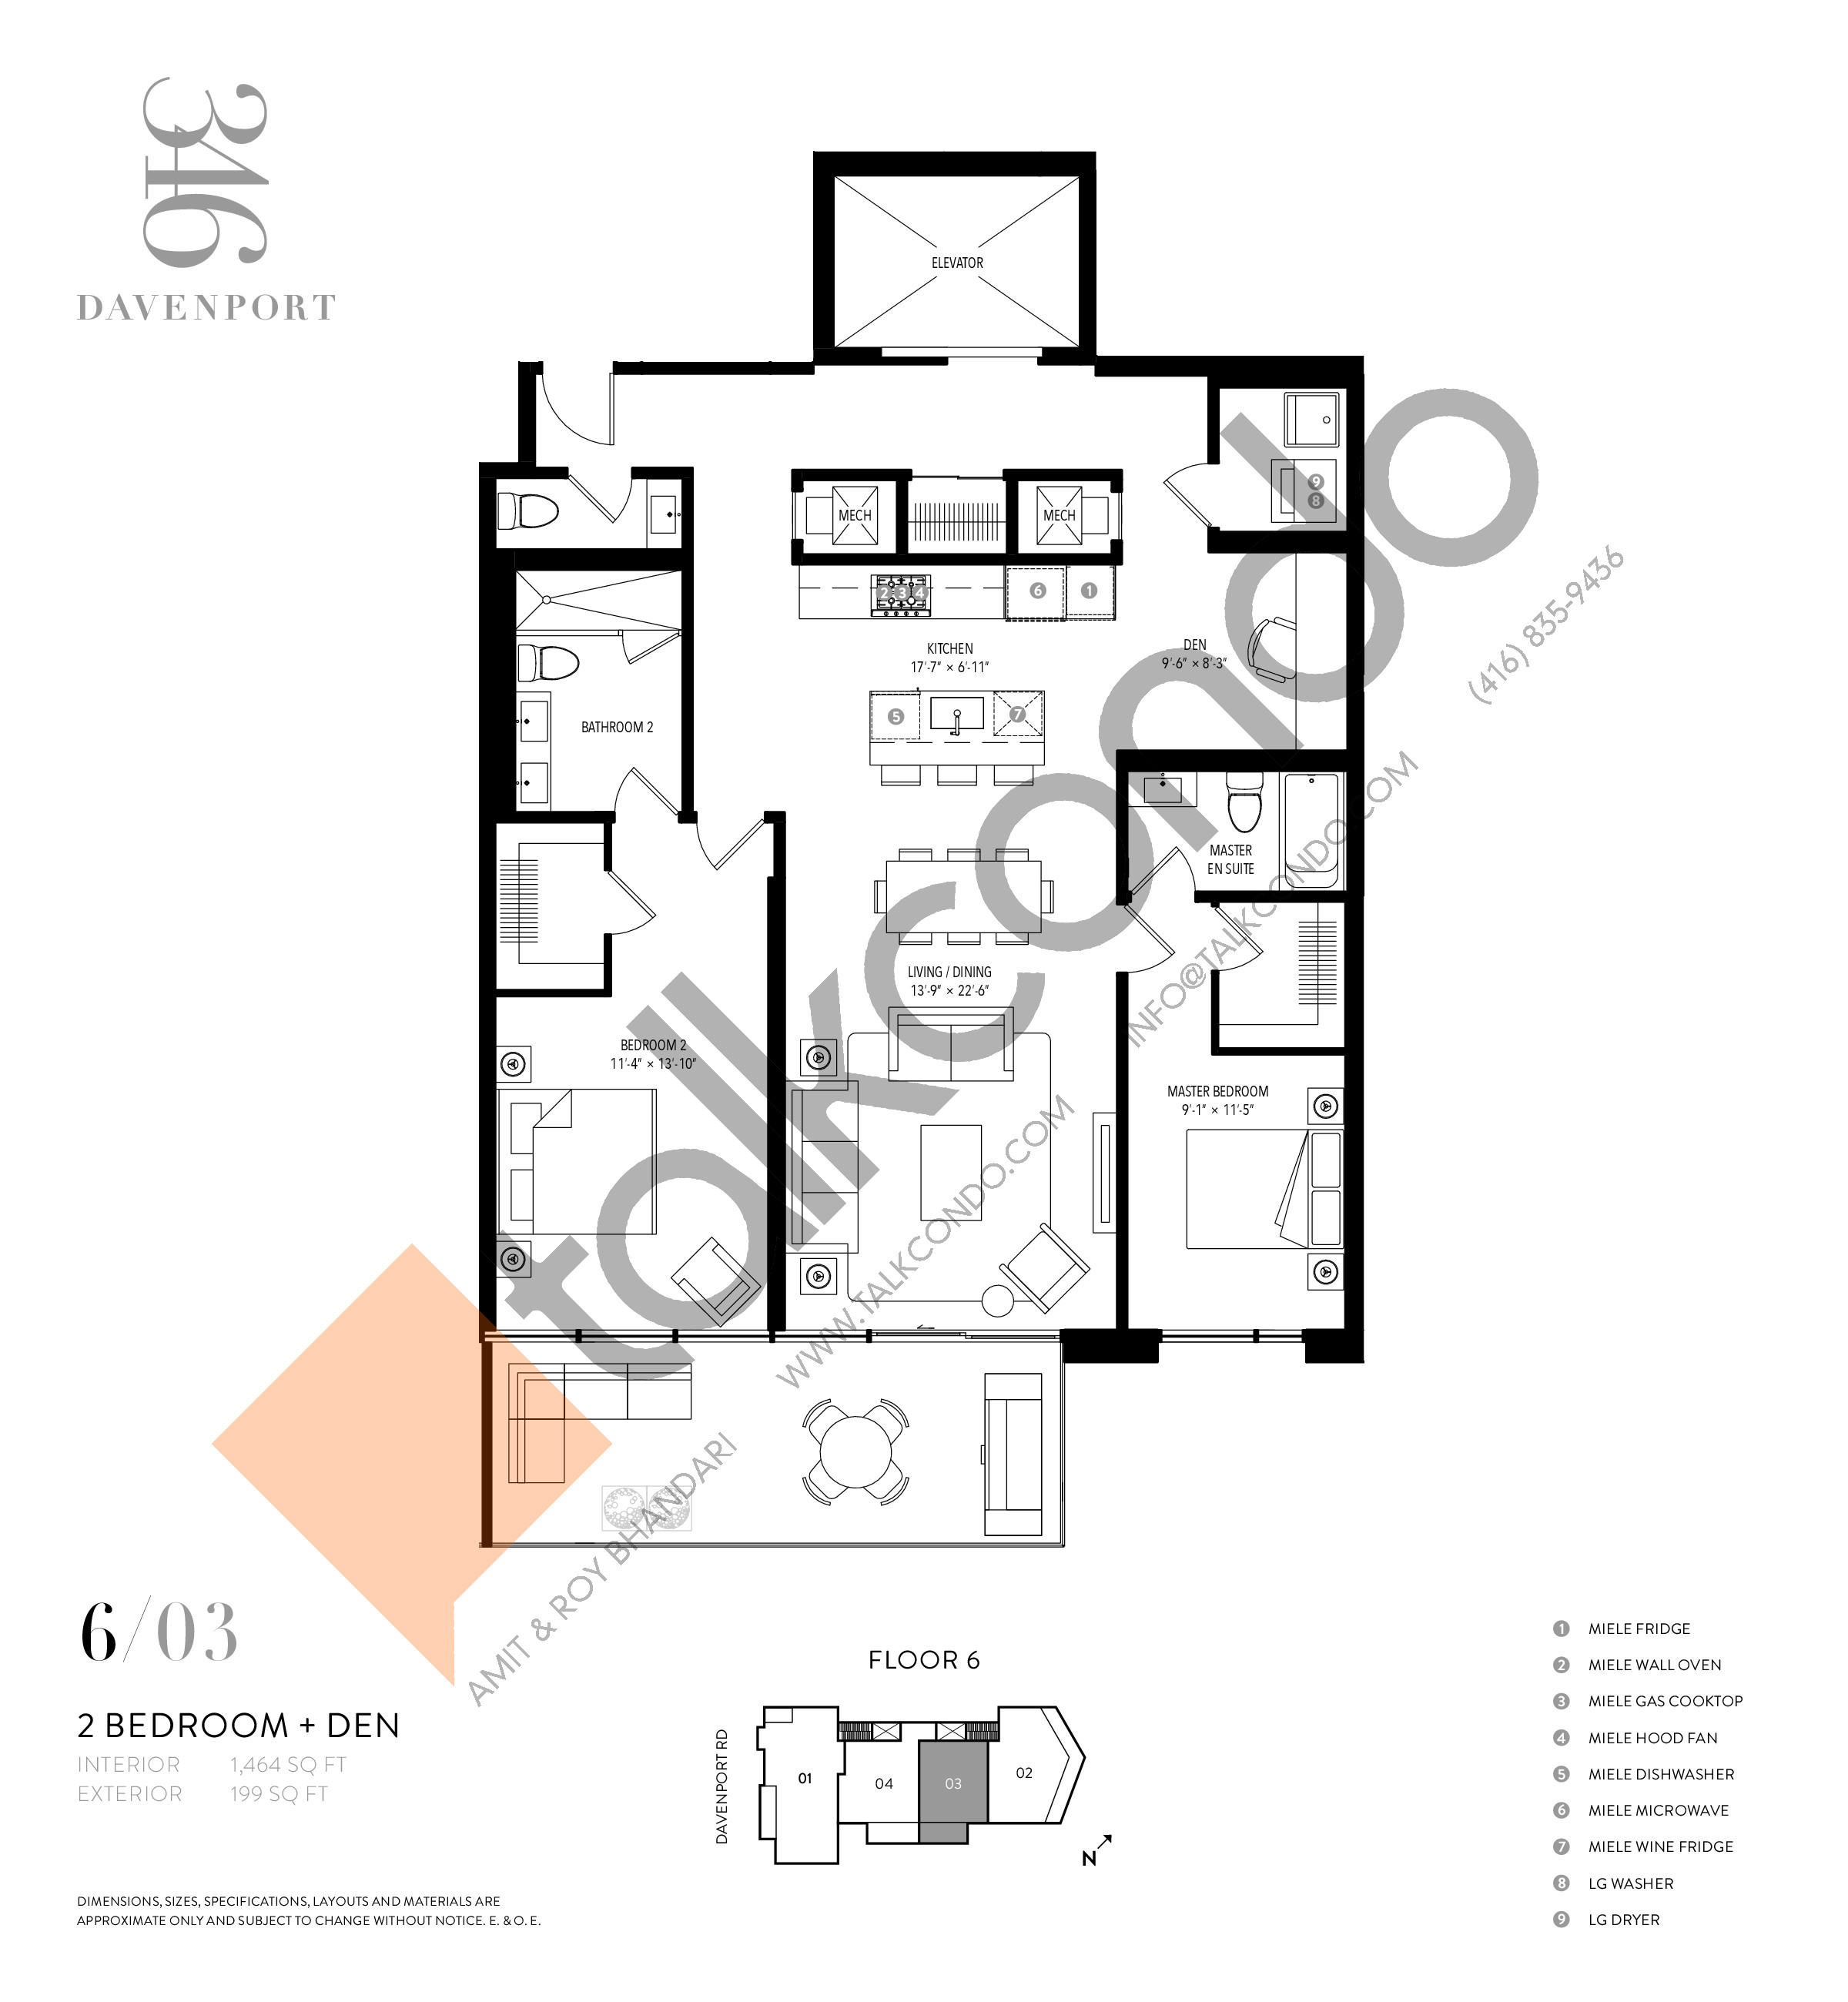 603 Floor Plan at 346 Davenport Condos - 1930 sq.ft